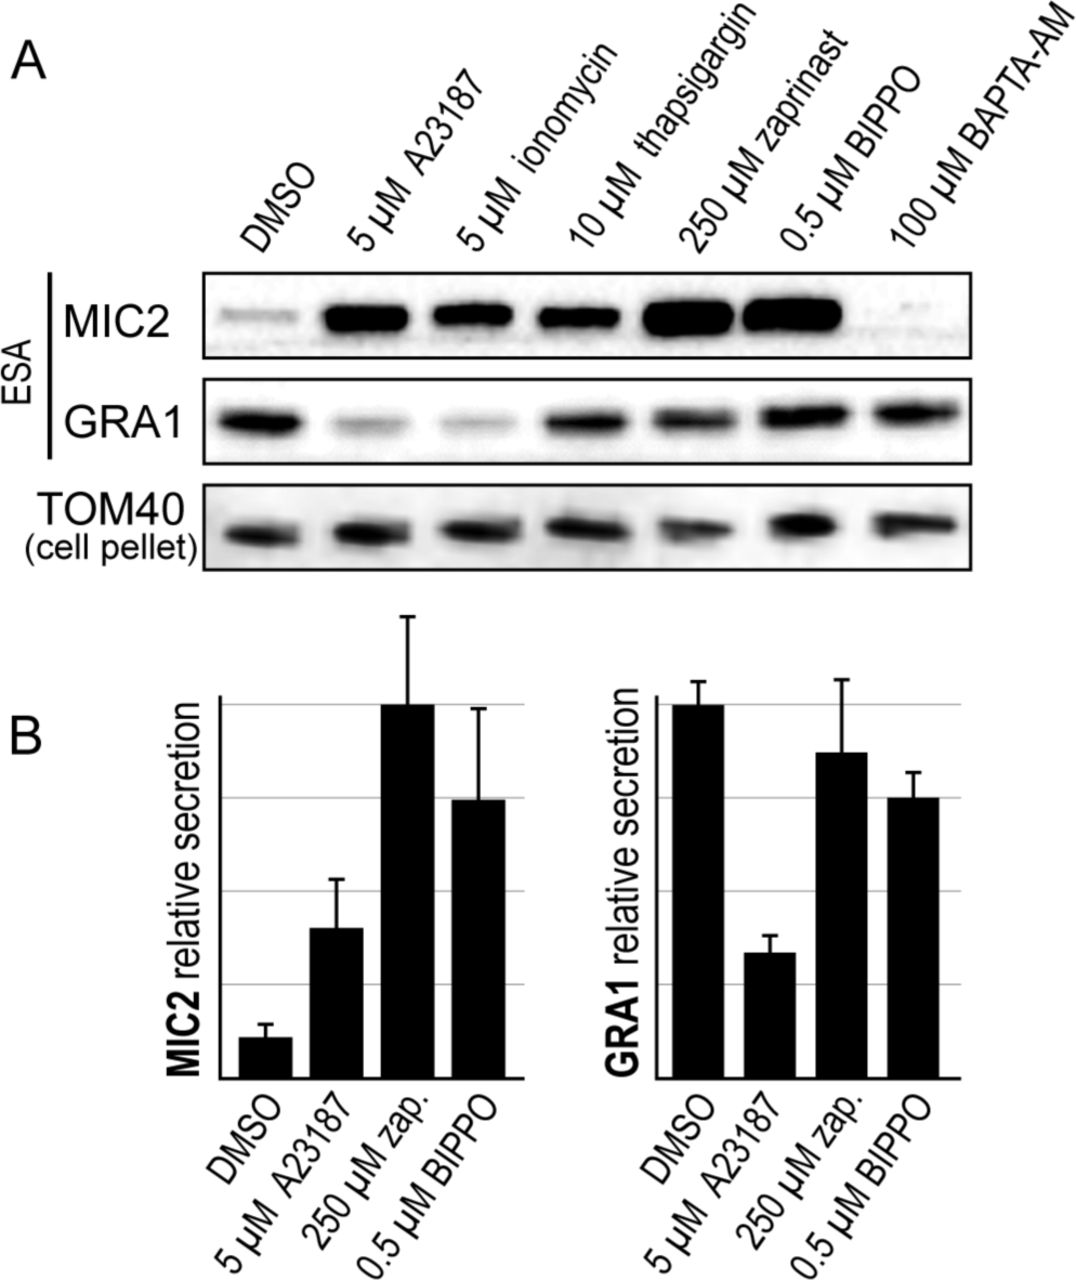 Calcium negatively regulates secretion from dense granules in